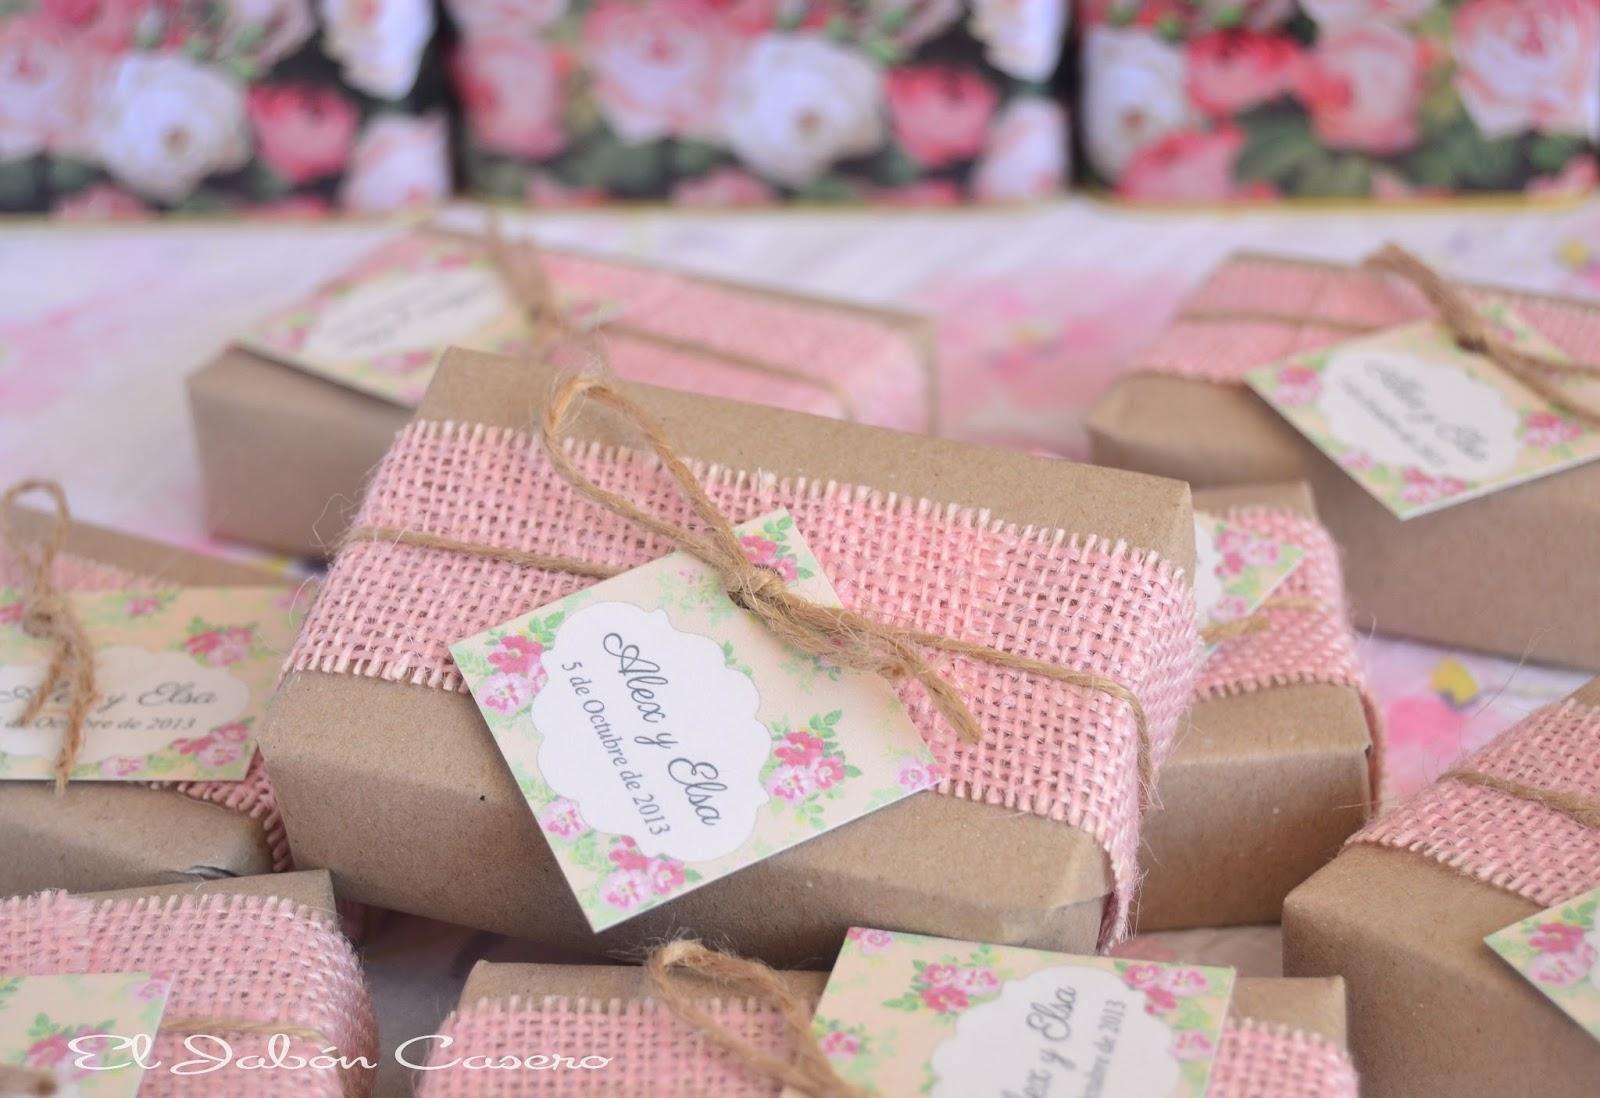 Detalles para boda ecologica jabones naturales